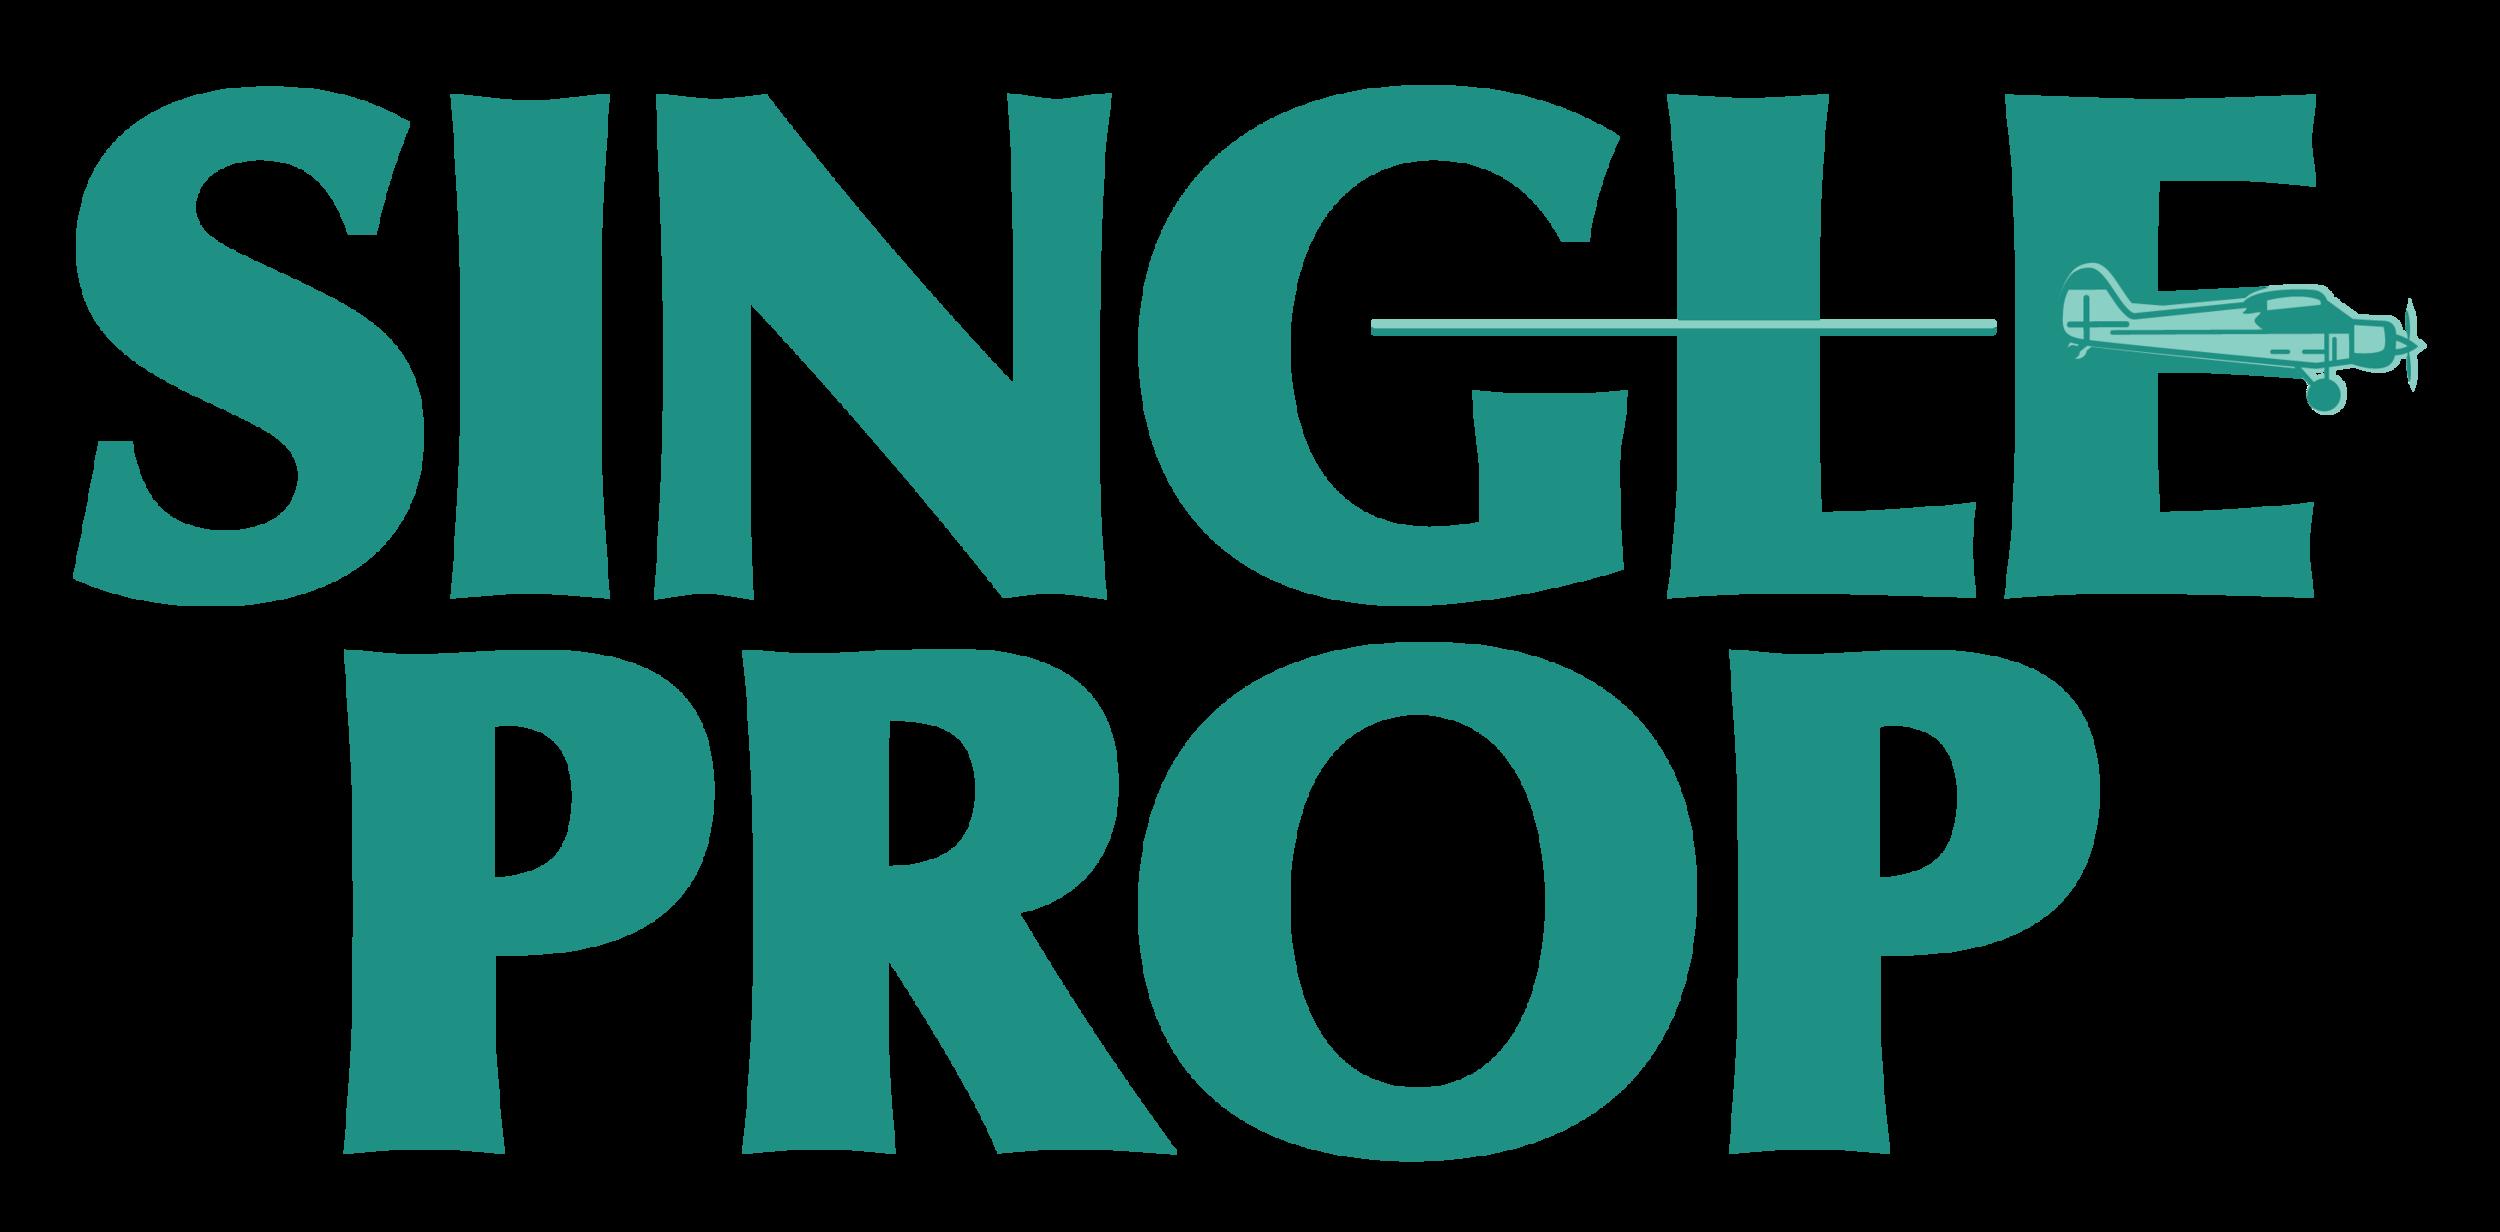 SP_primary_logo_fullColor_green.png